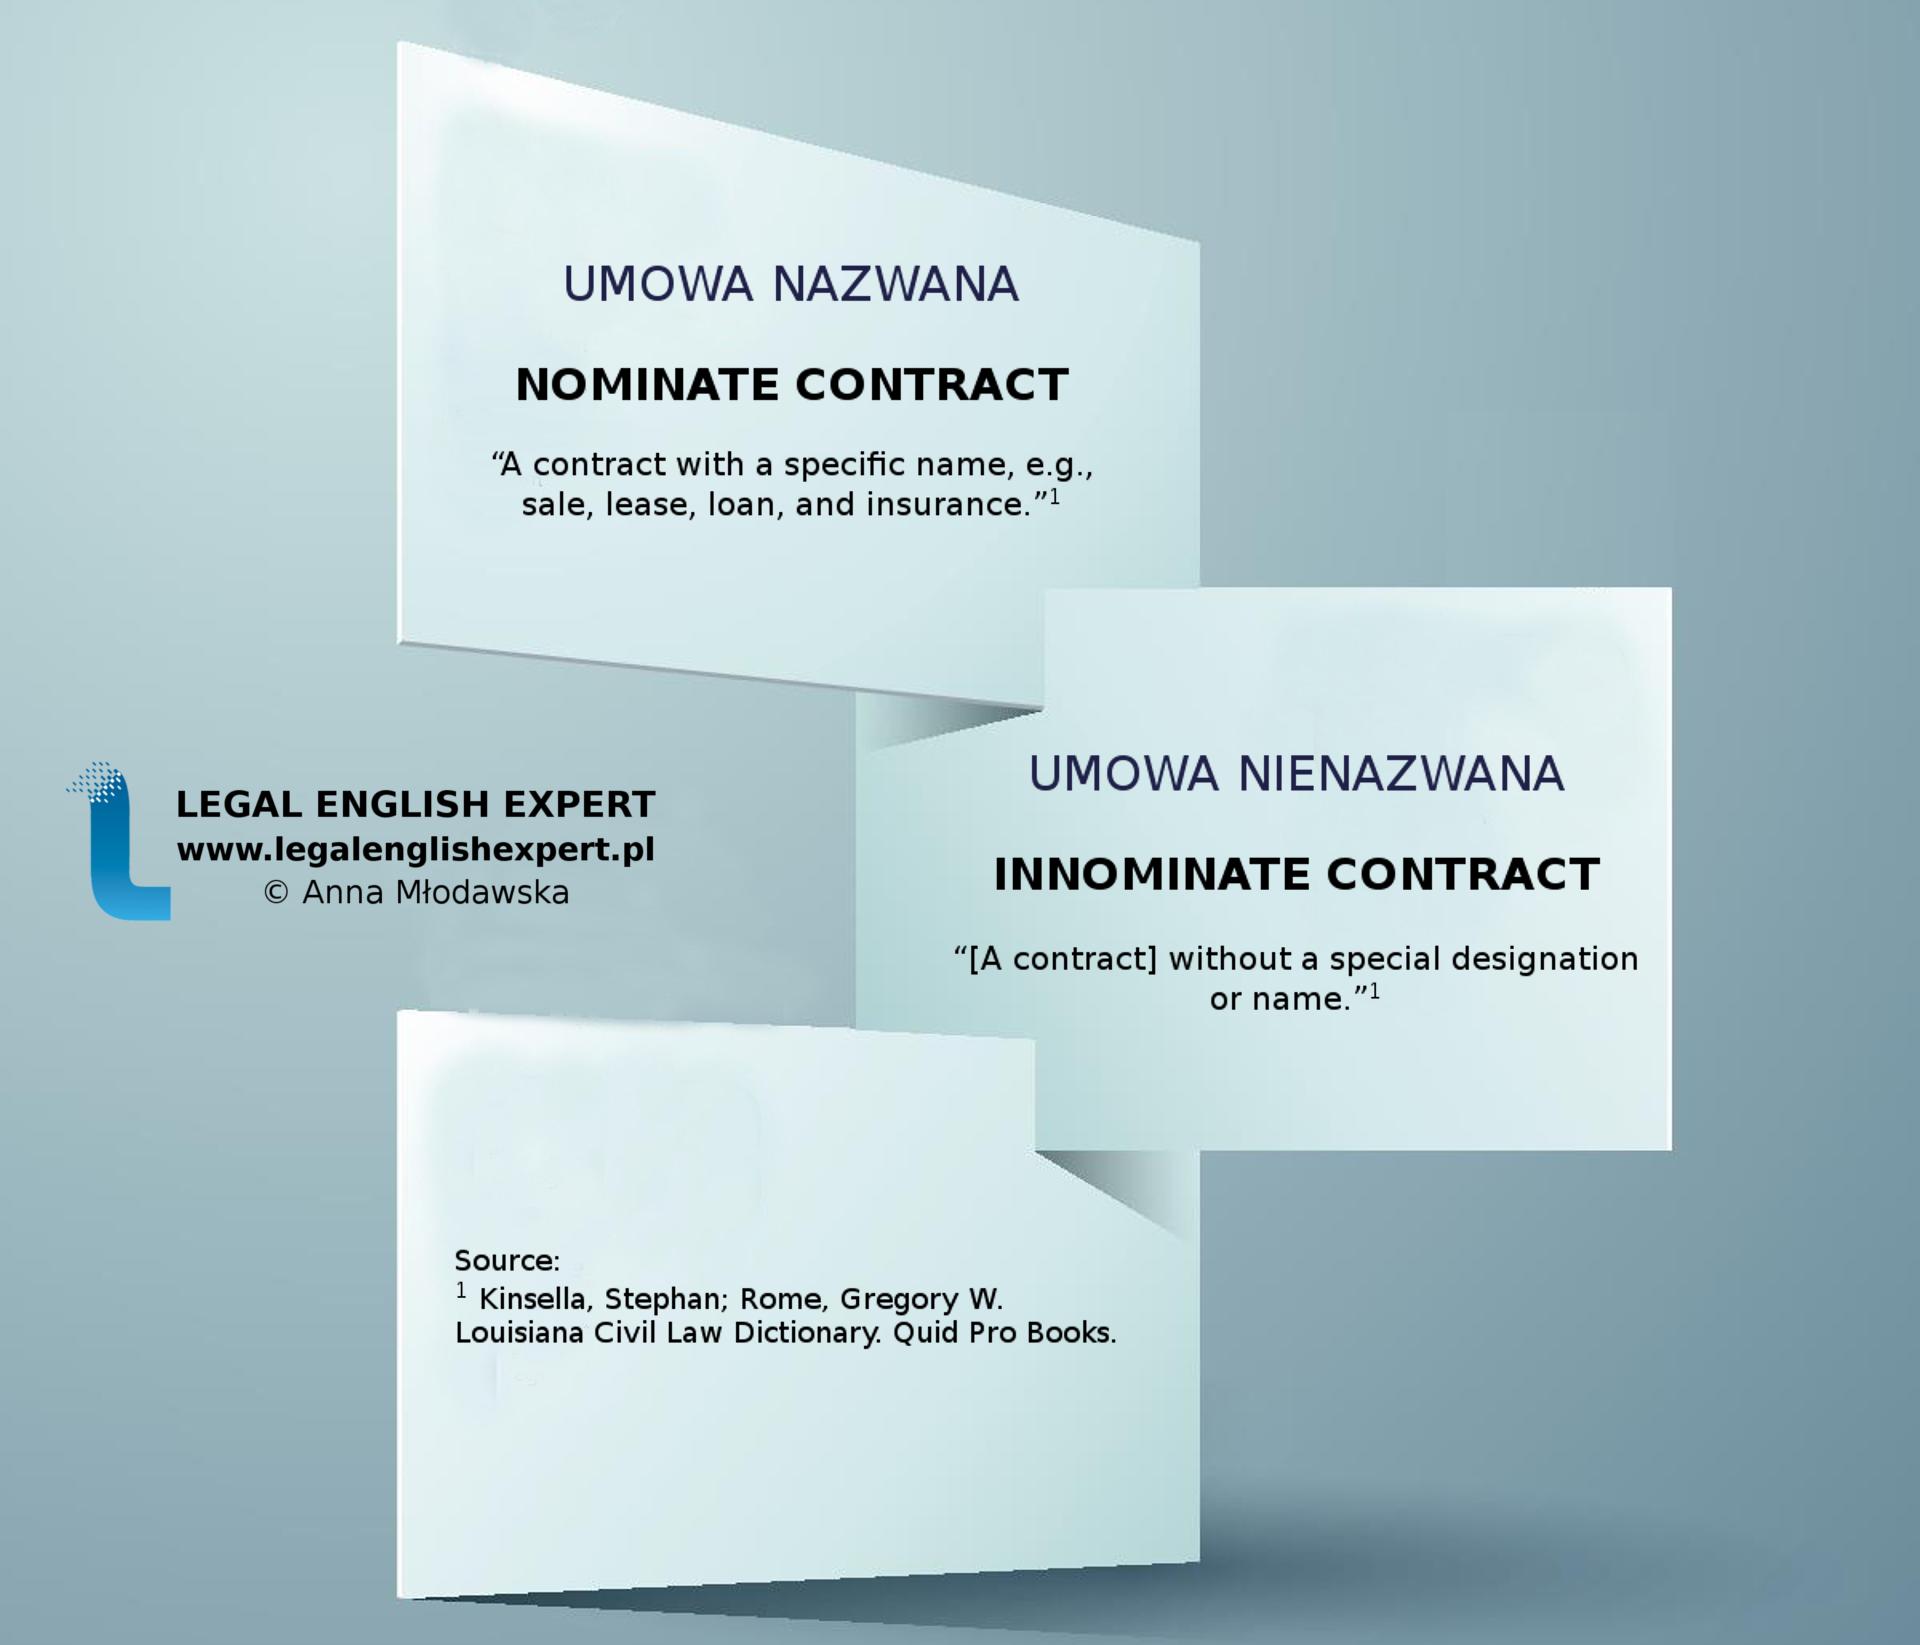 LEGAL ENGLISH EXPERT - infografika_44 - umowa nazwana i nienazwana